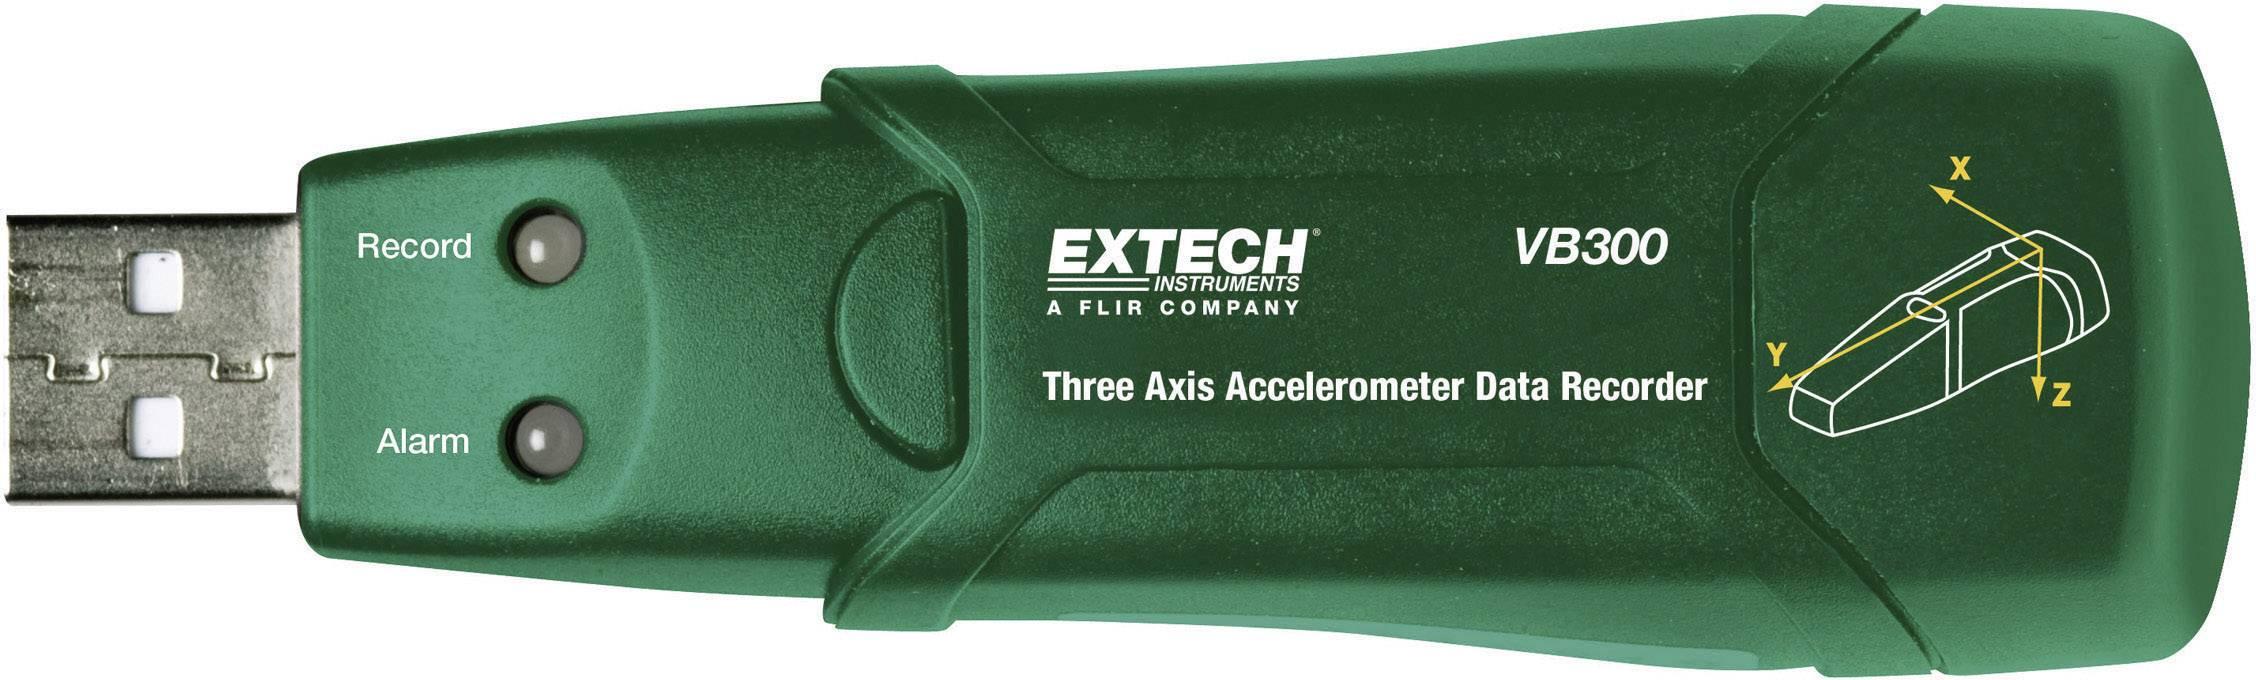 Akcelerometer s dataloggerom pre 3 osi Extech VB300